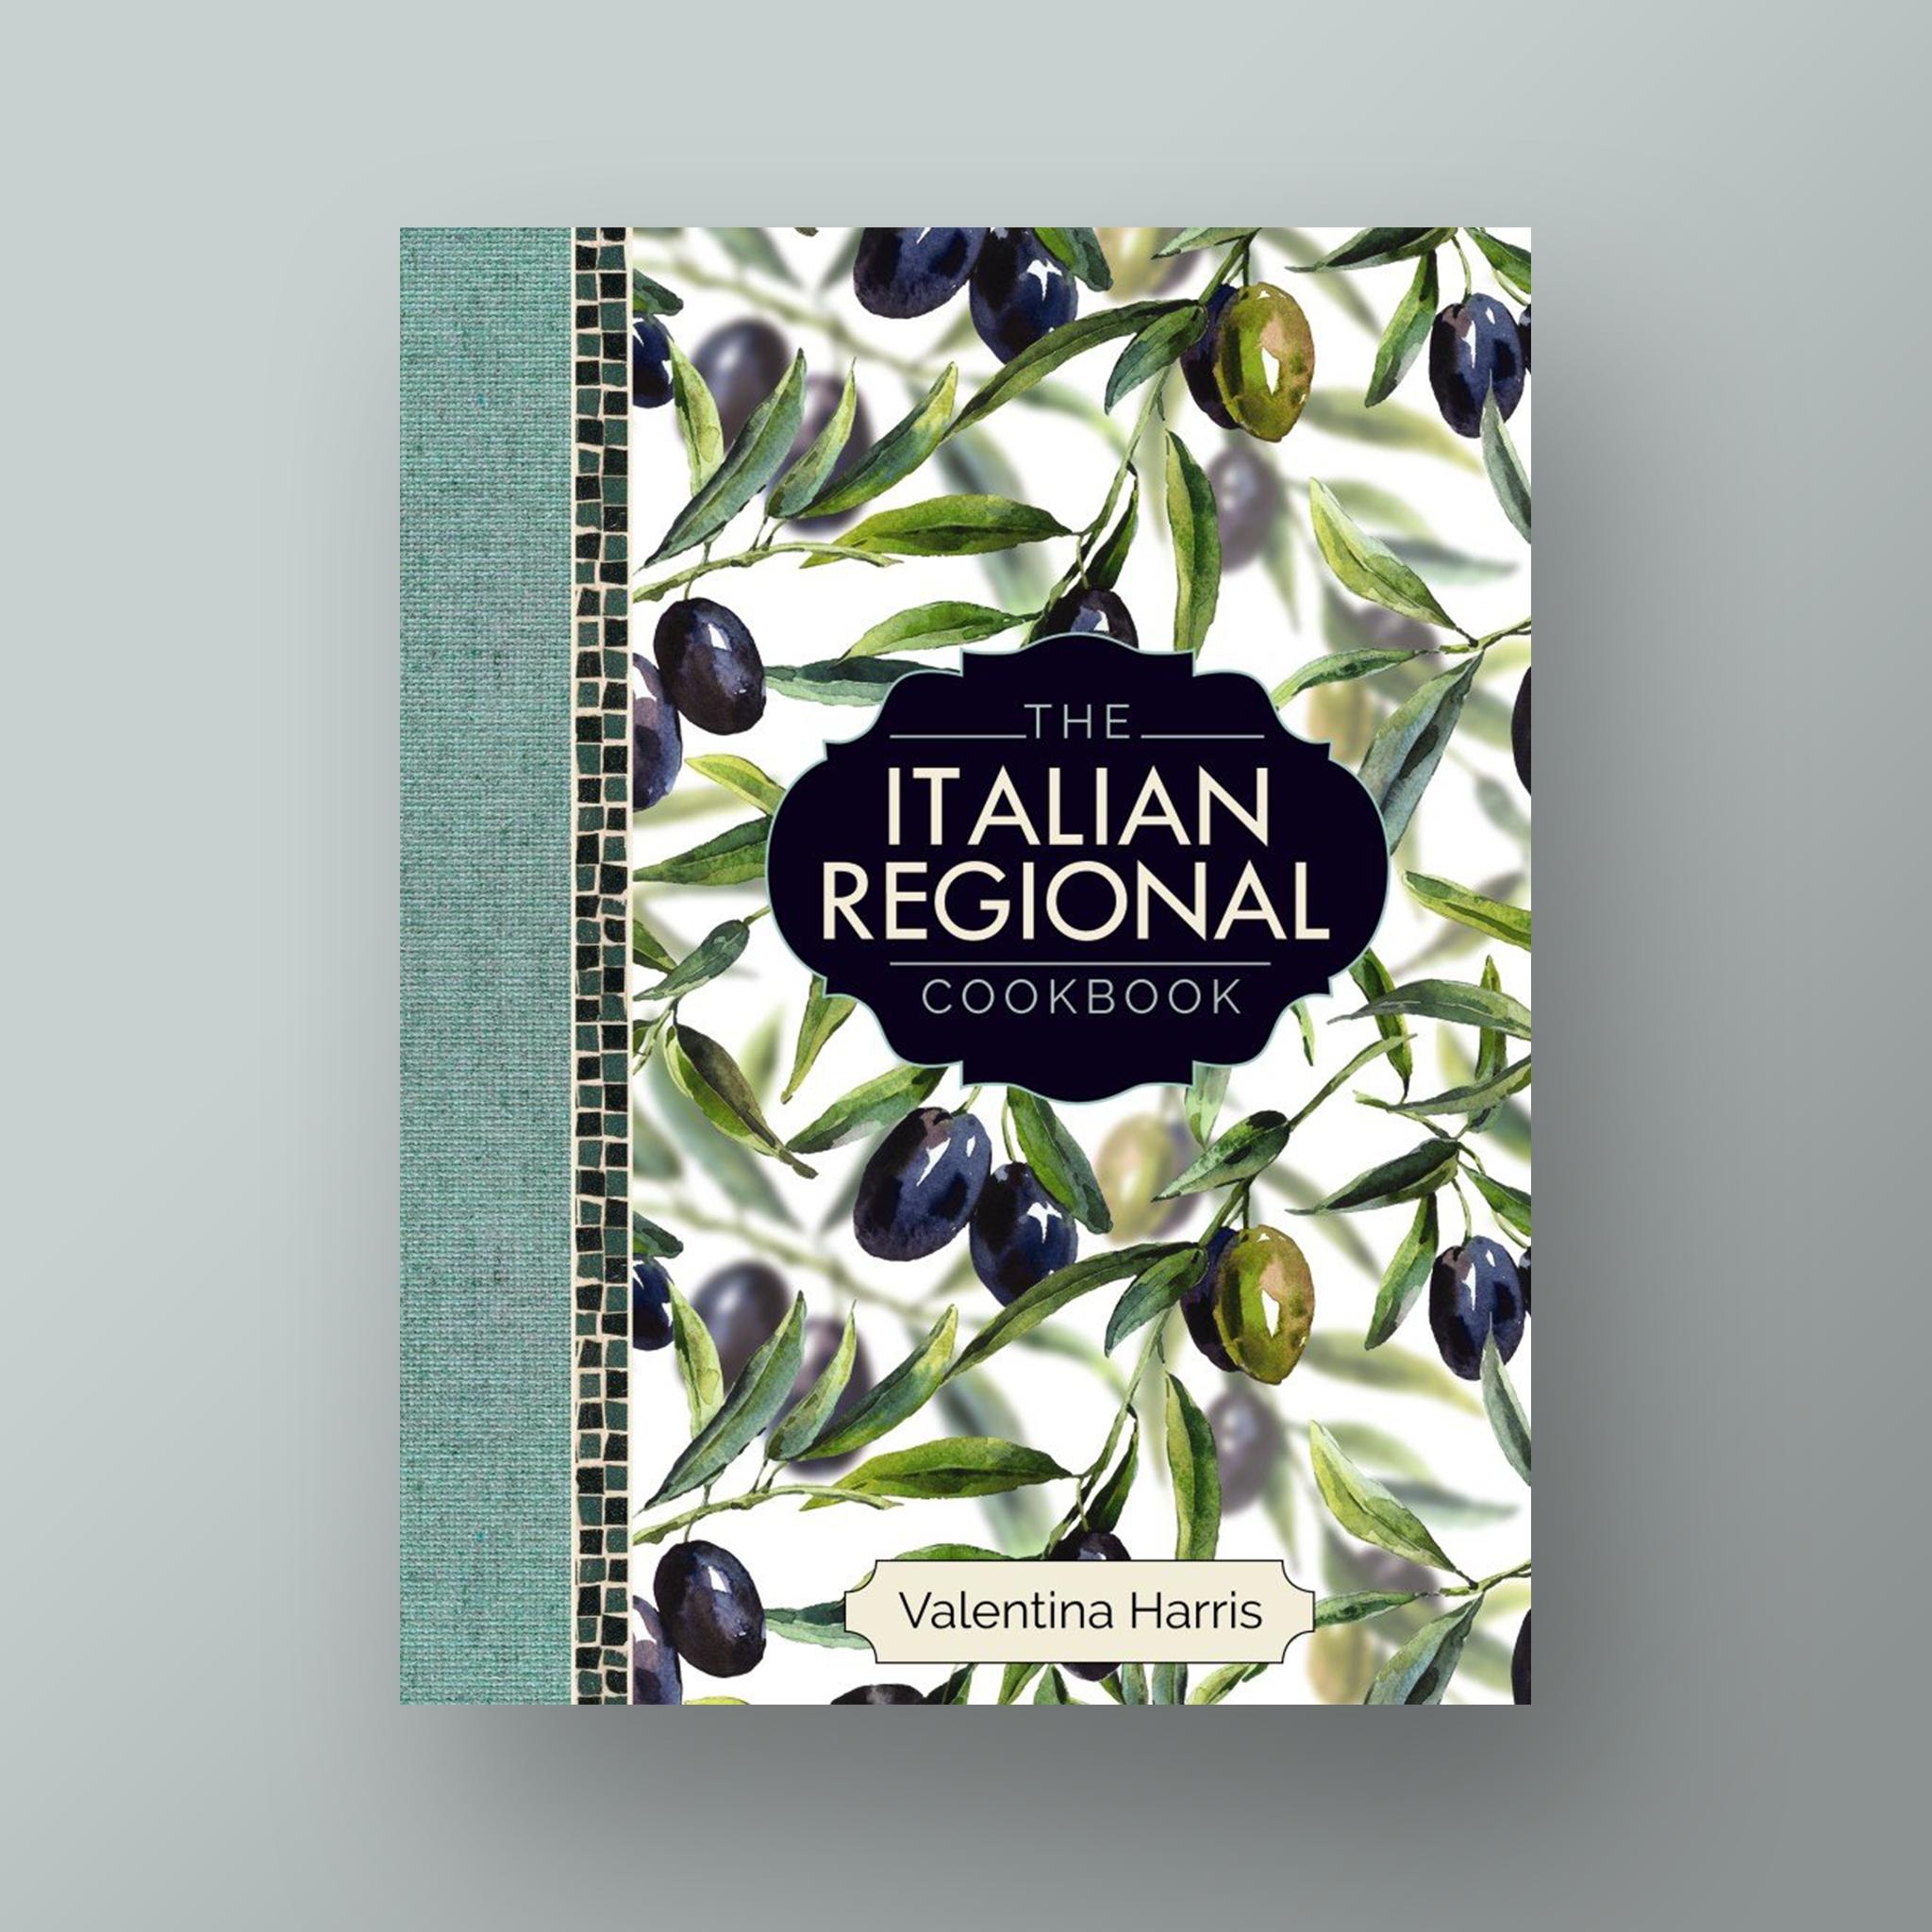 The Italian Regional Cookbook  cover